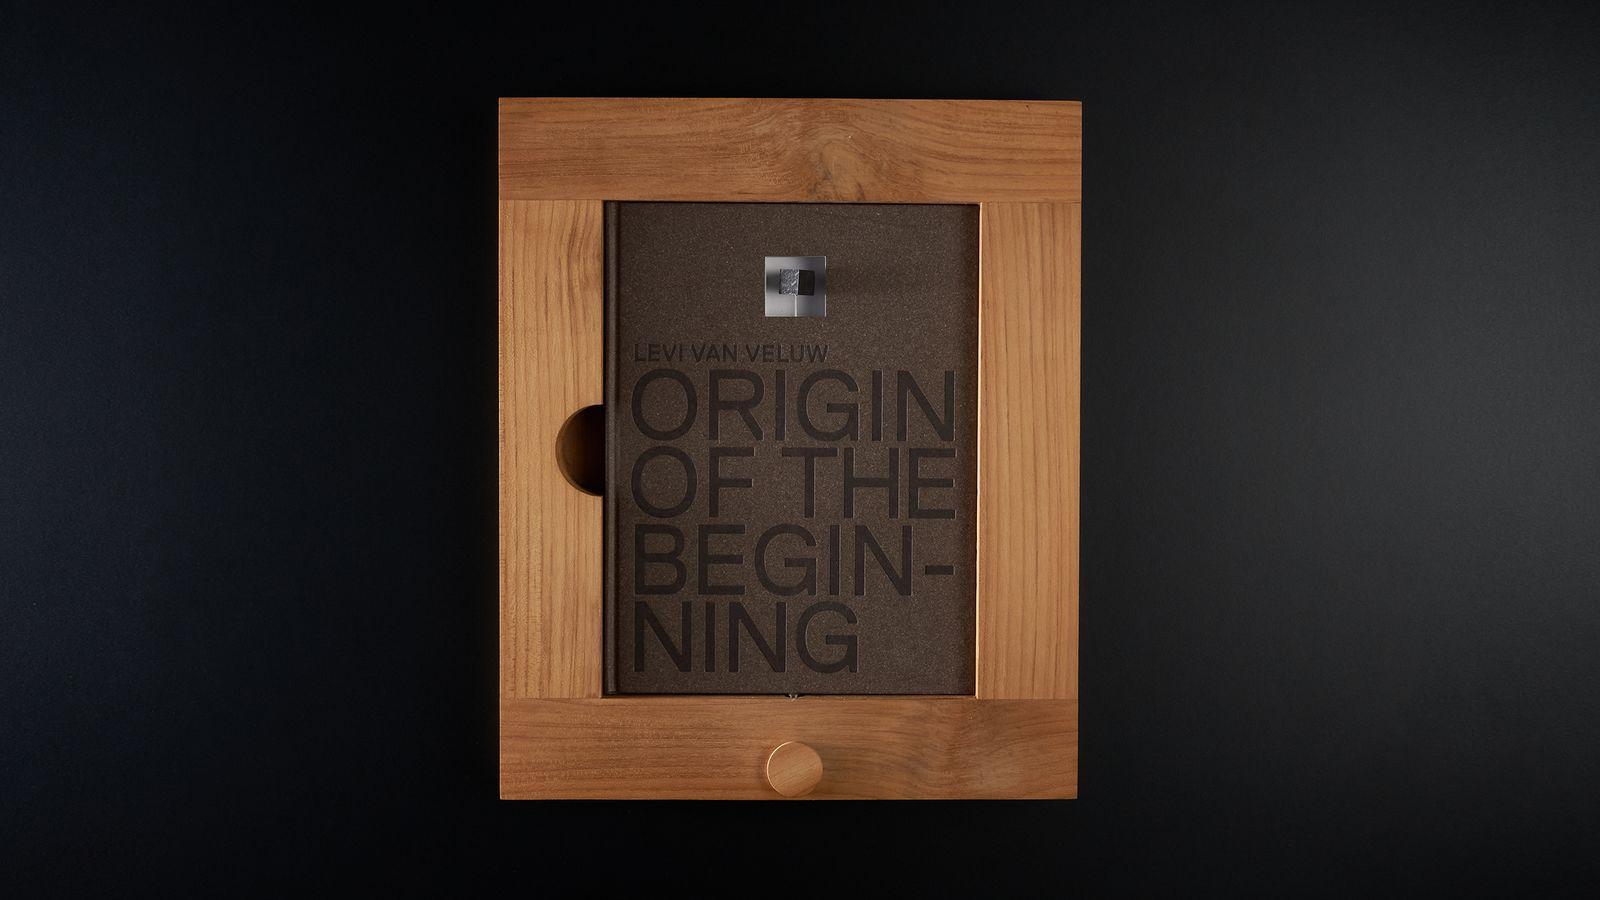 Origin of the beginning - cover met frame.jpg